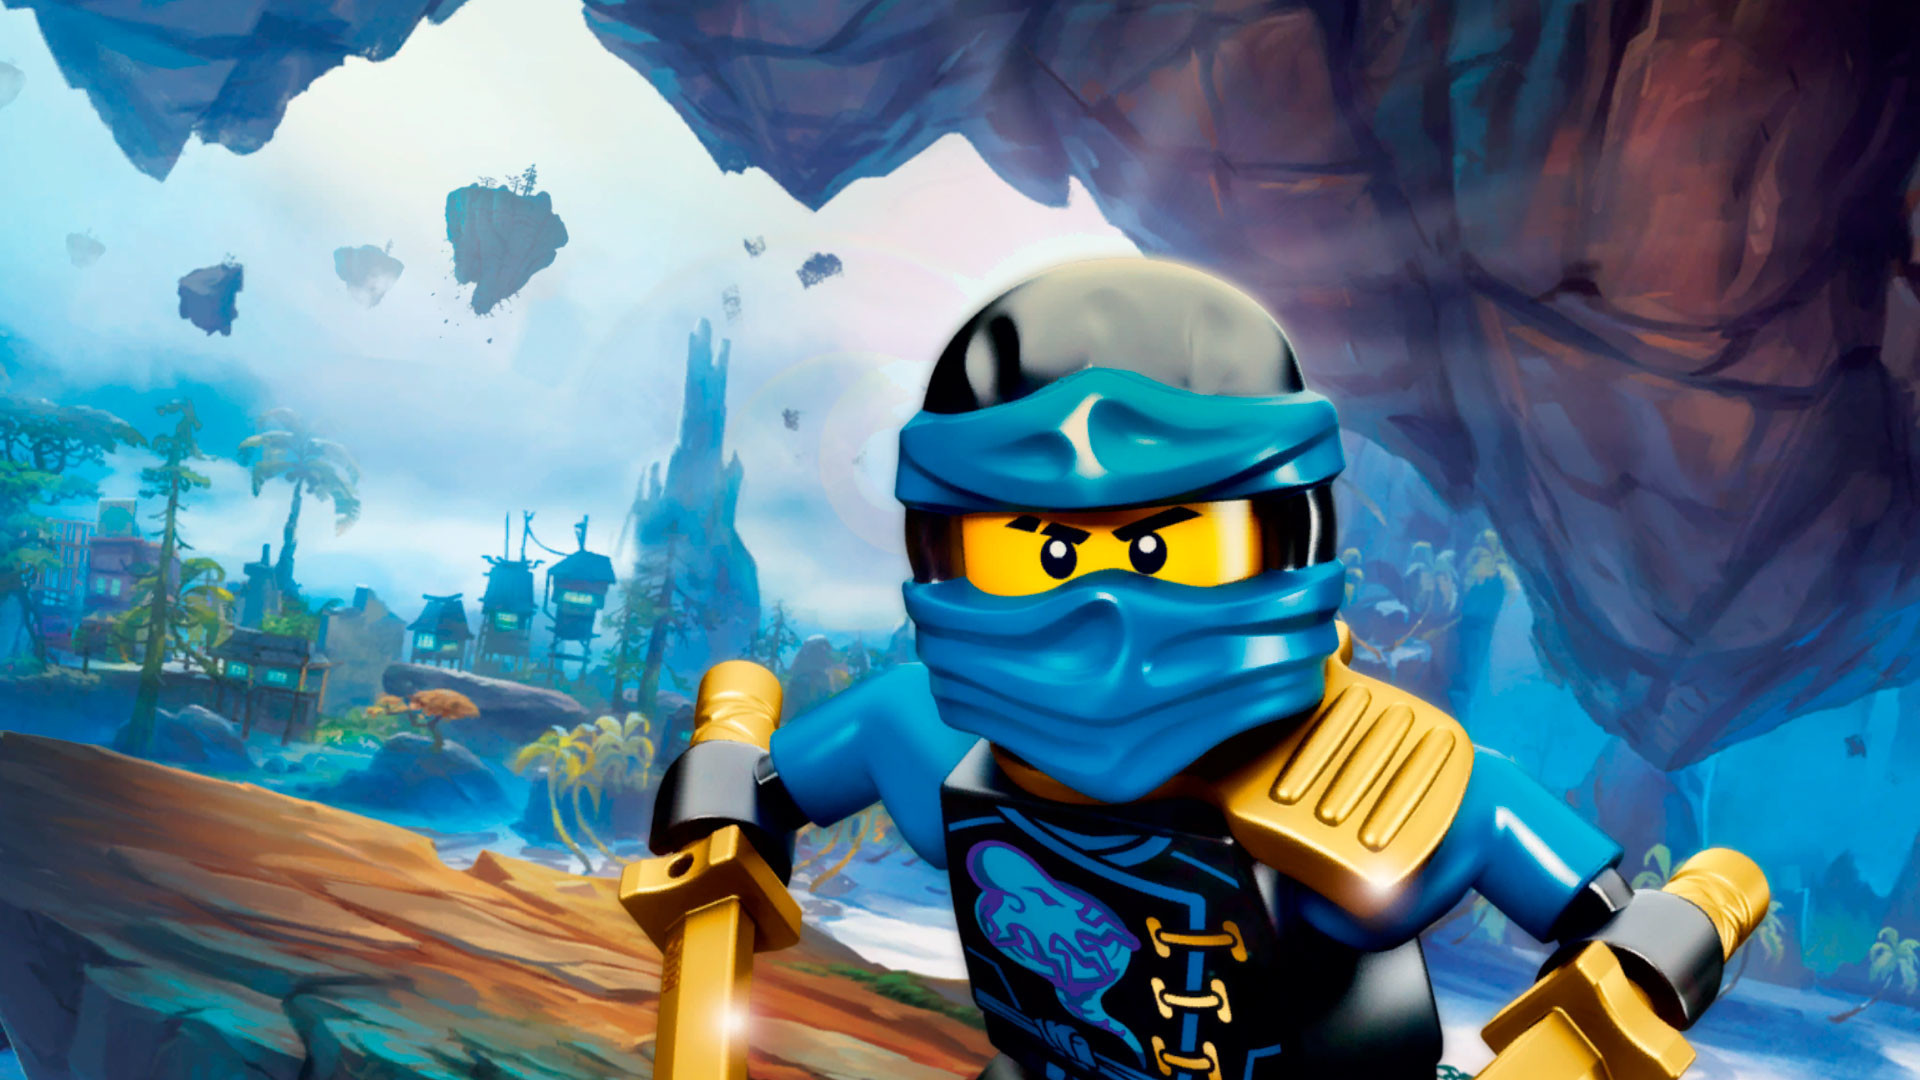 Ninjago hd wallpaper 71 images - Lego ninjago d or ...